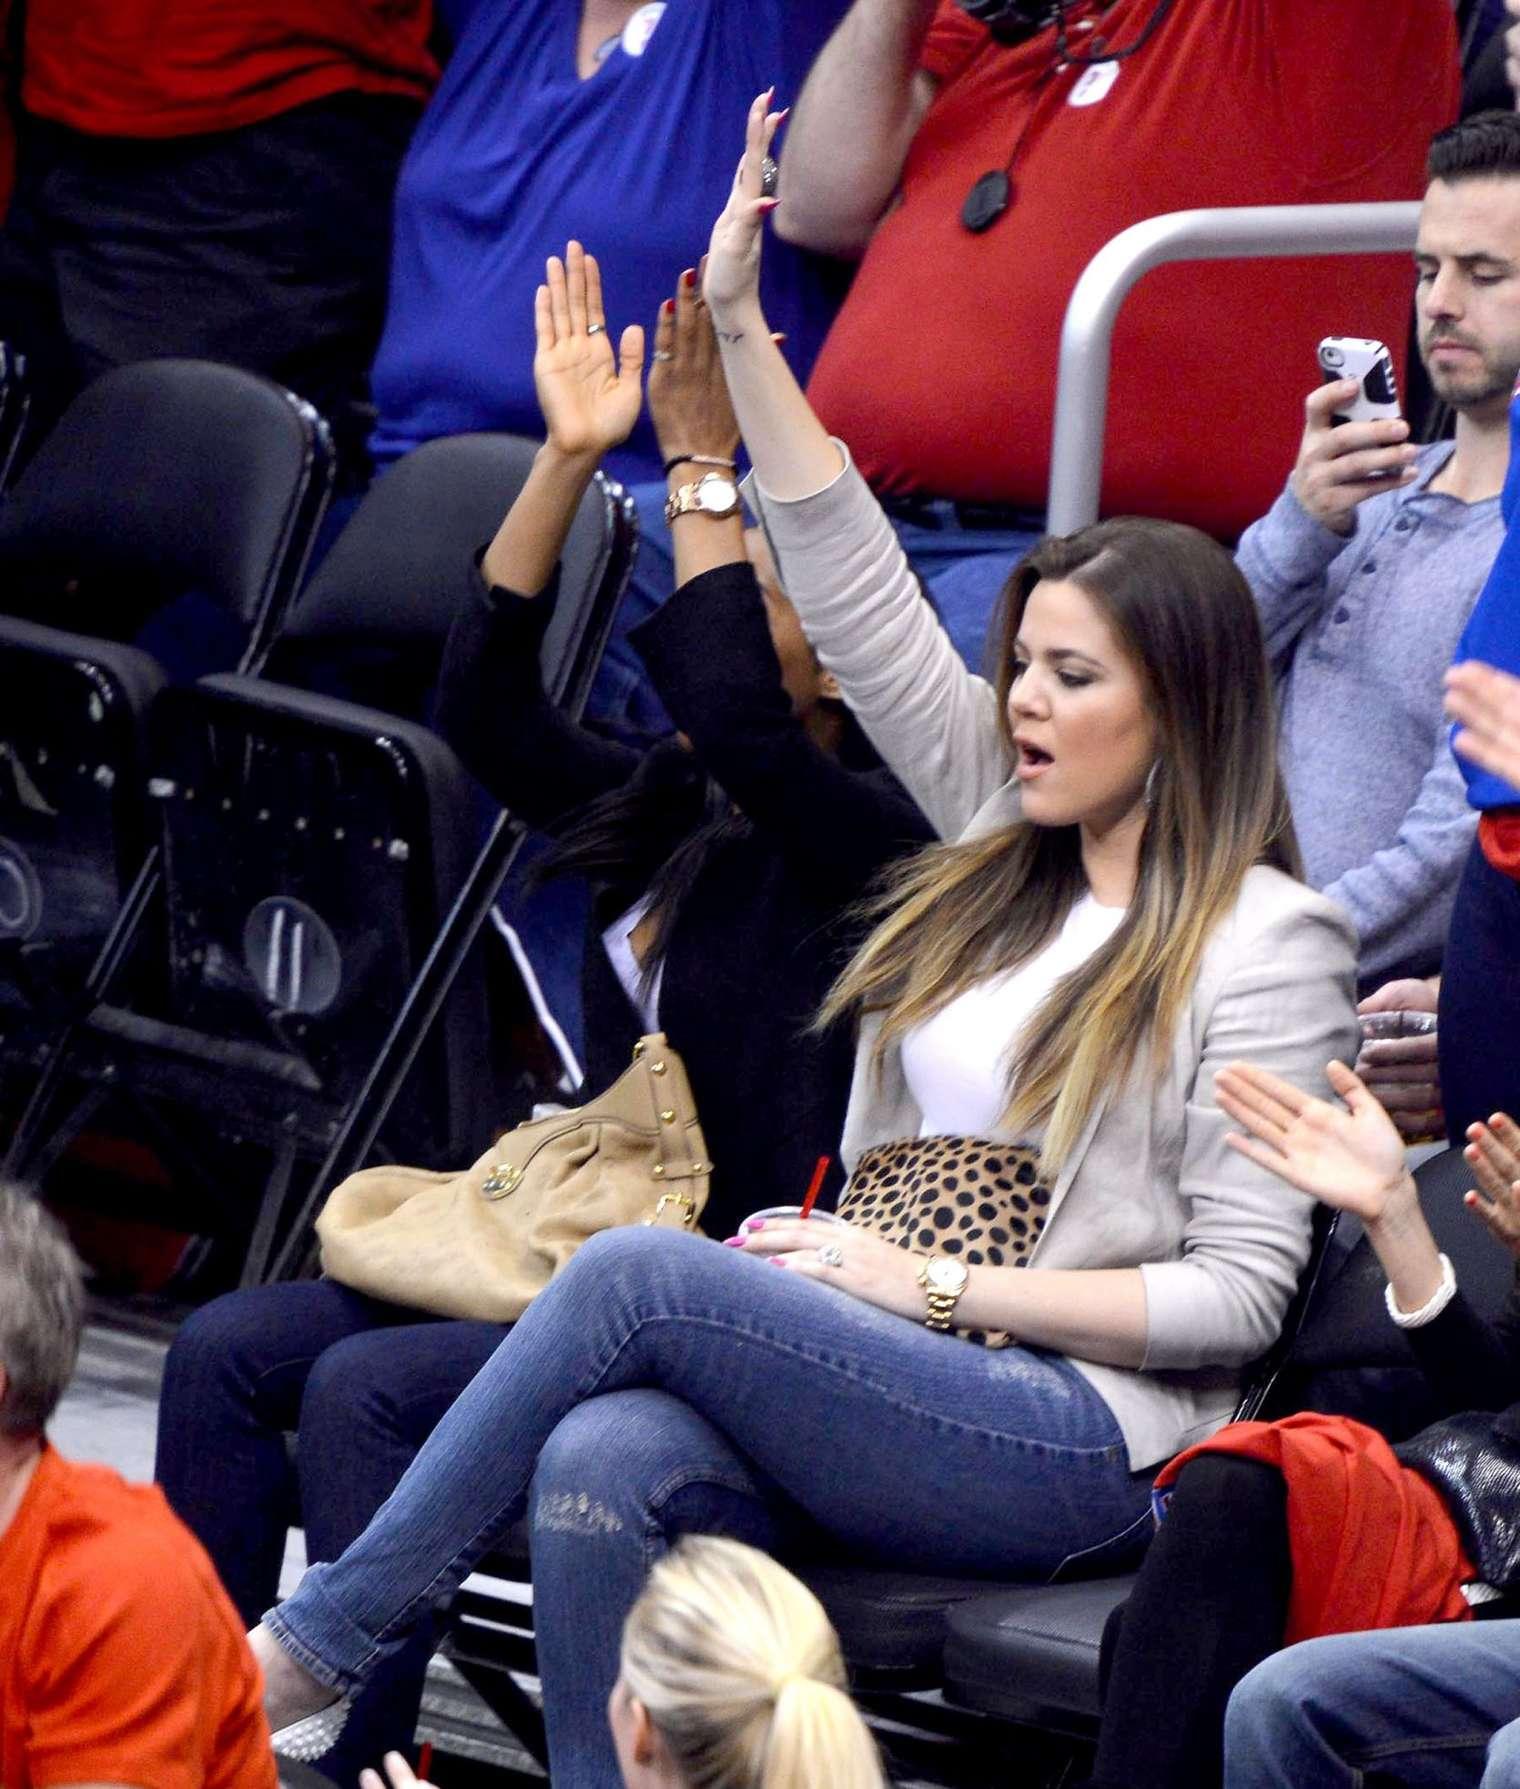 Khloe Kardashian 2013 : Khloe Kardashian at the LA Clippers game -08